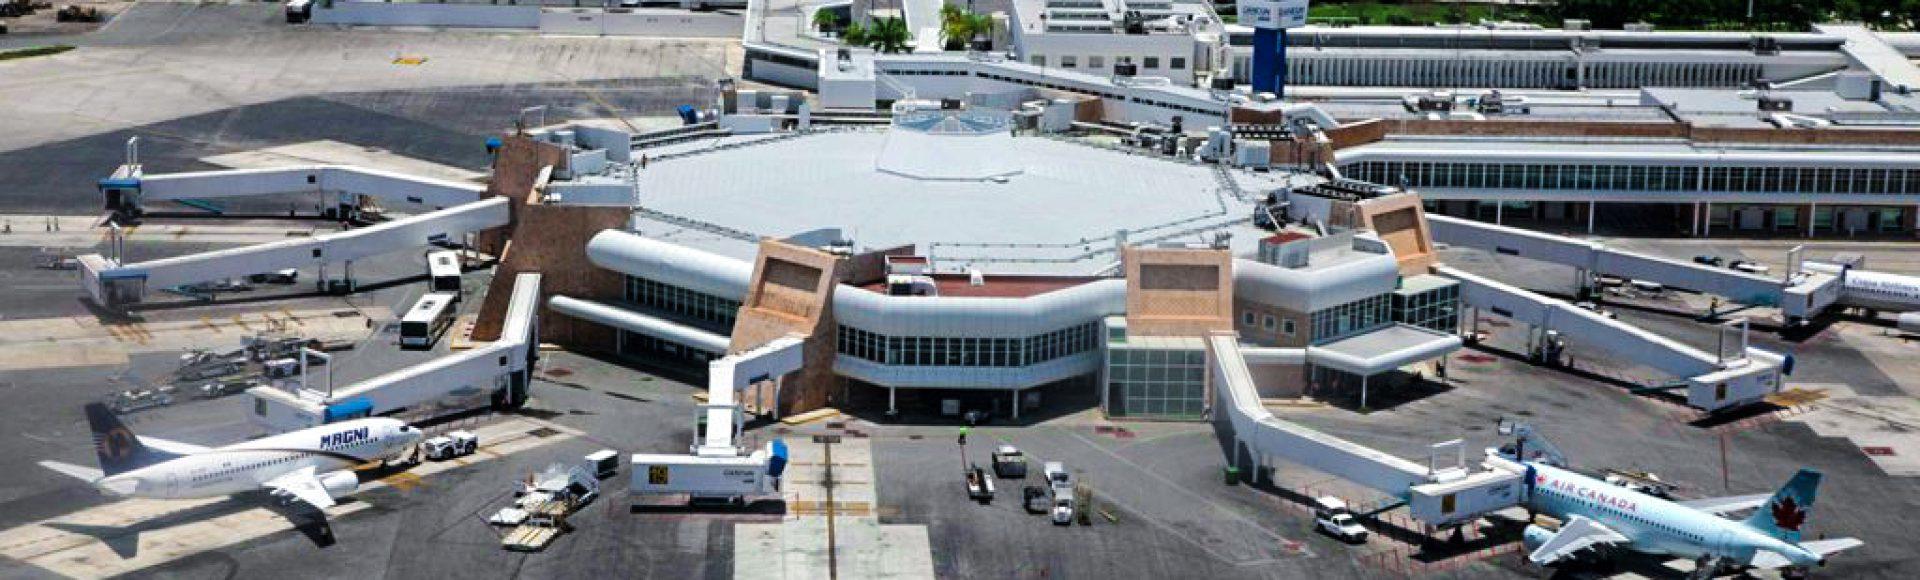 Aeropuerto_Internacional_de_Cancun_Mexico copie